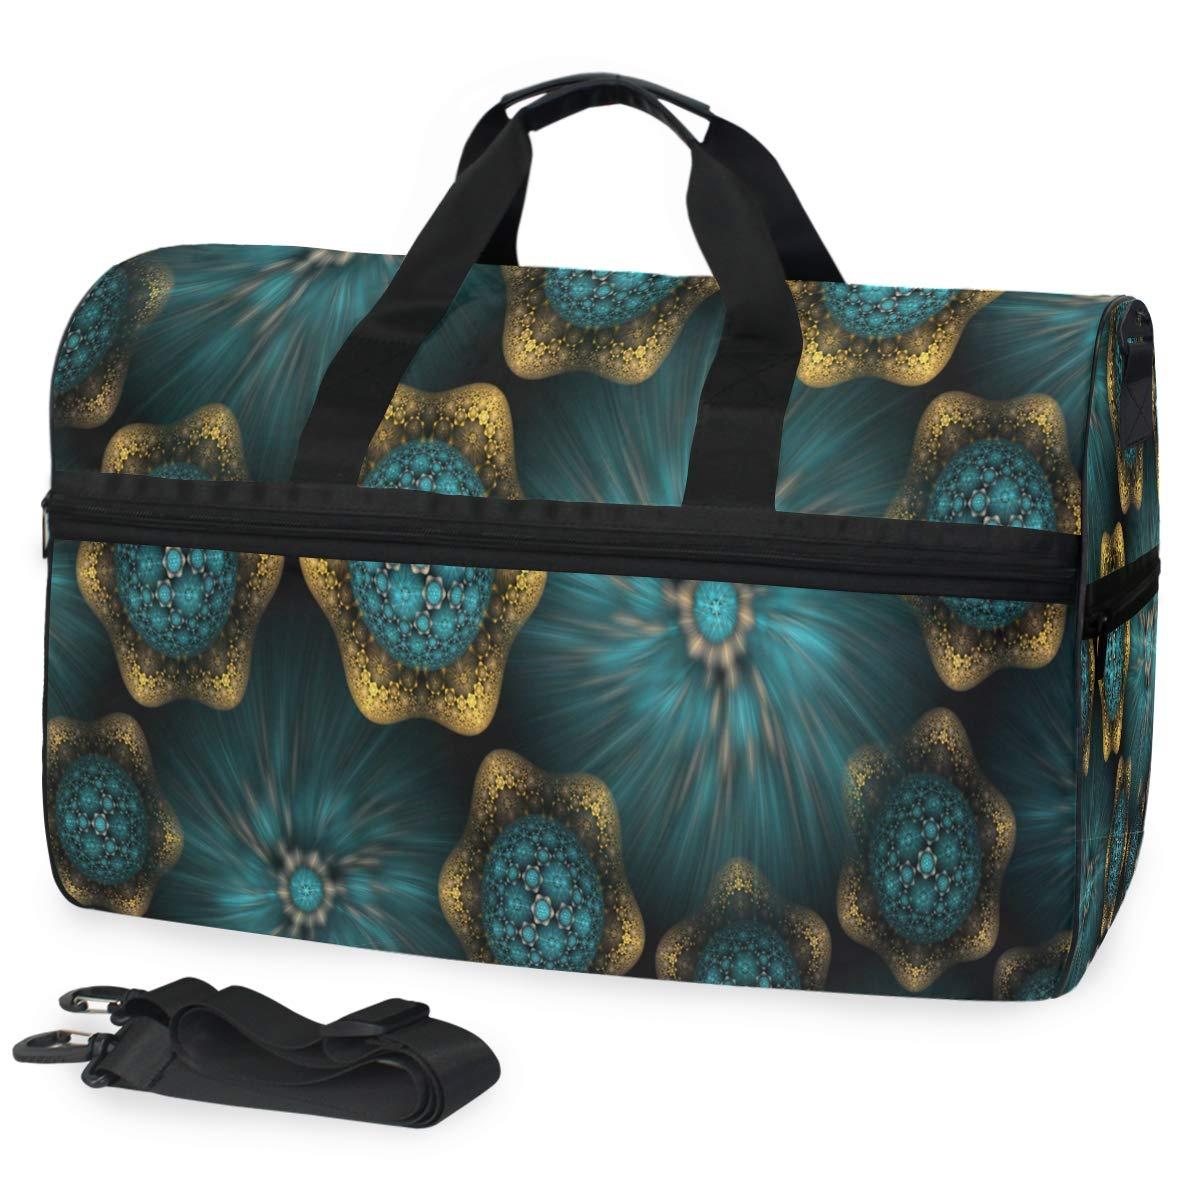 Fractal Art Gym Bags for Men/&Women Duffel Bag Casual Fashion Bag with Shoe Compartment